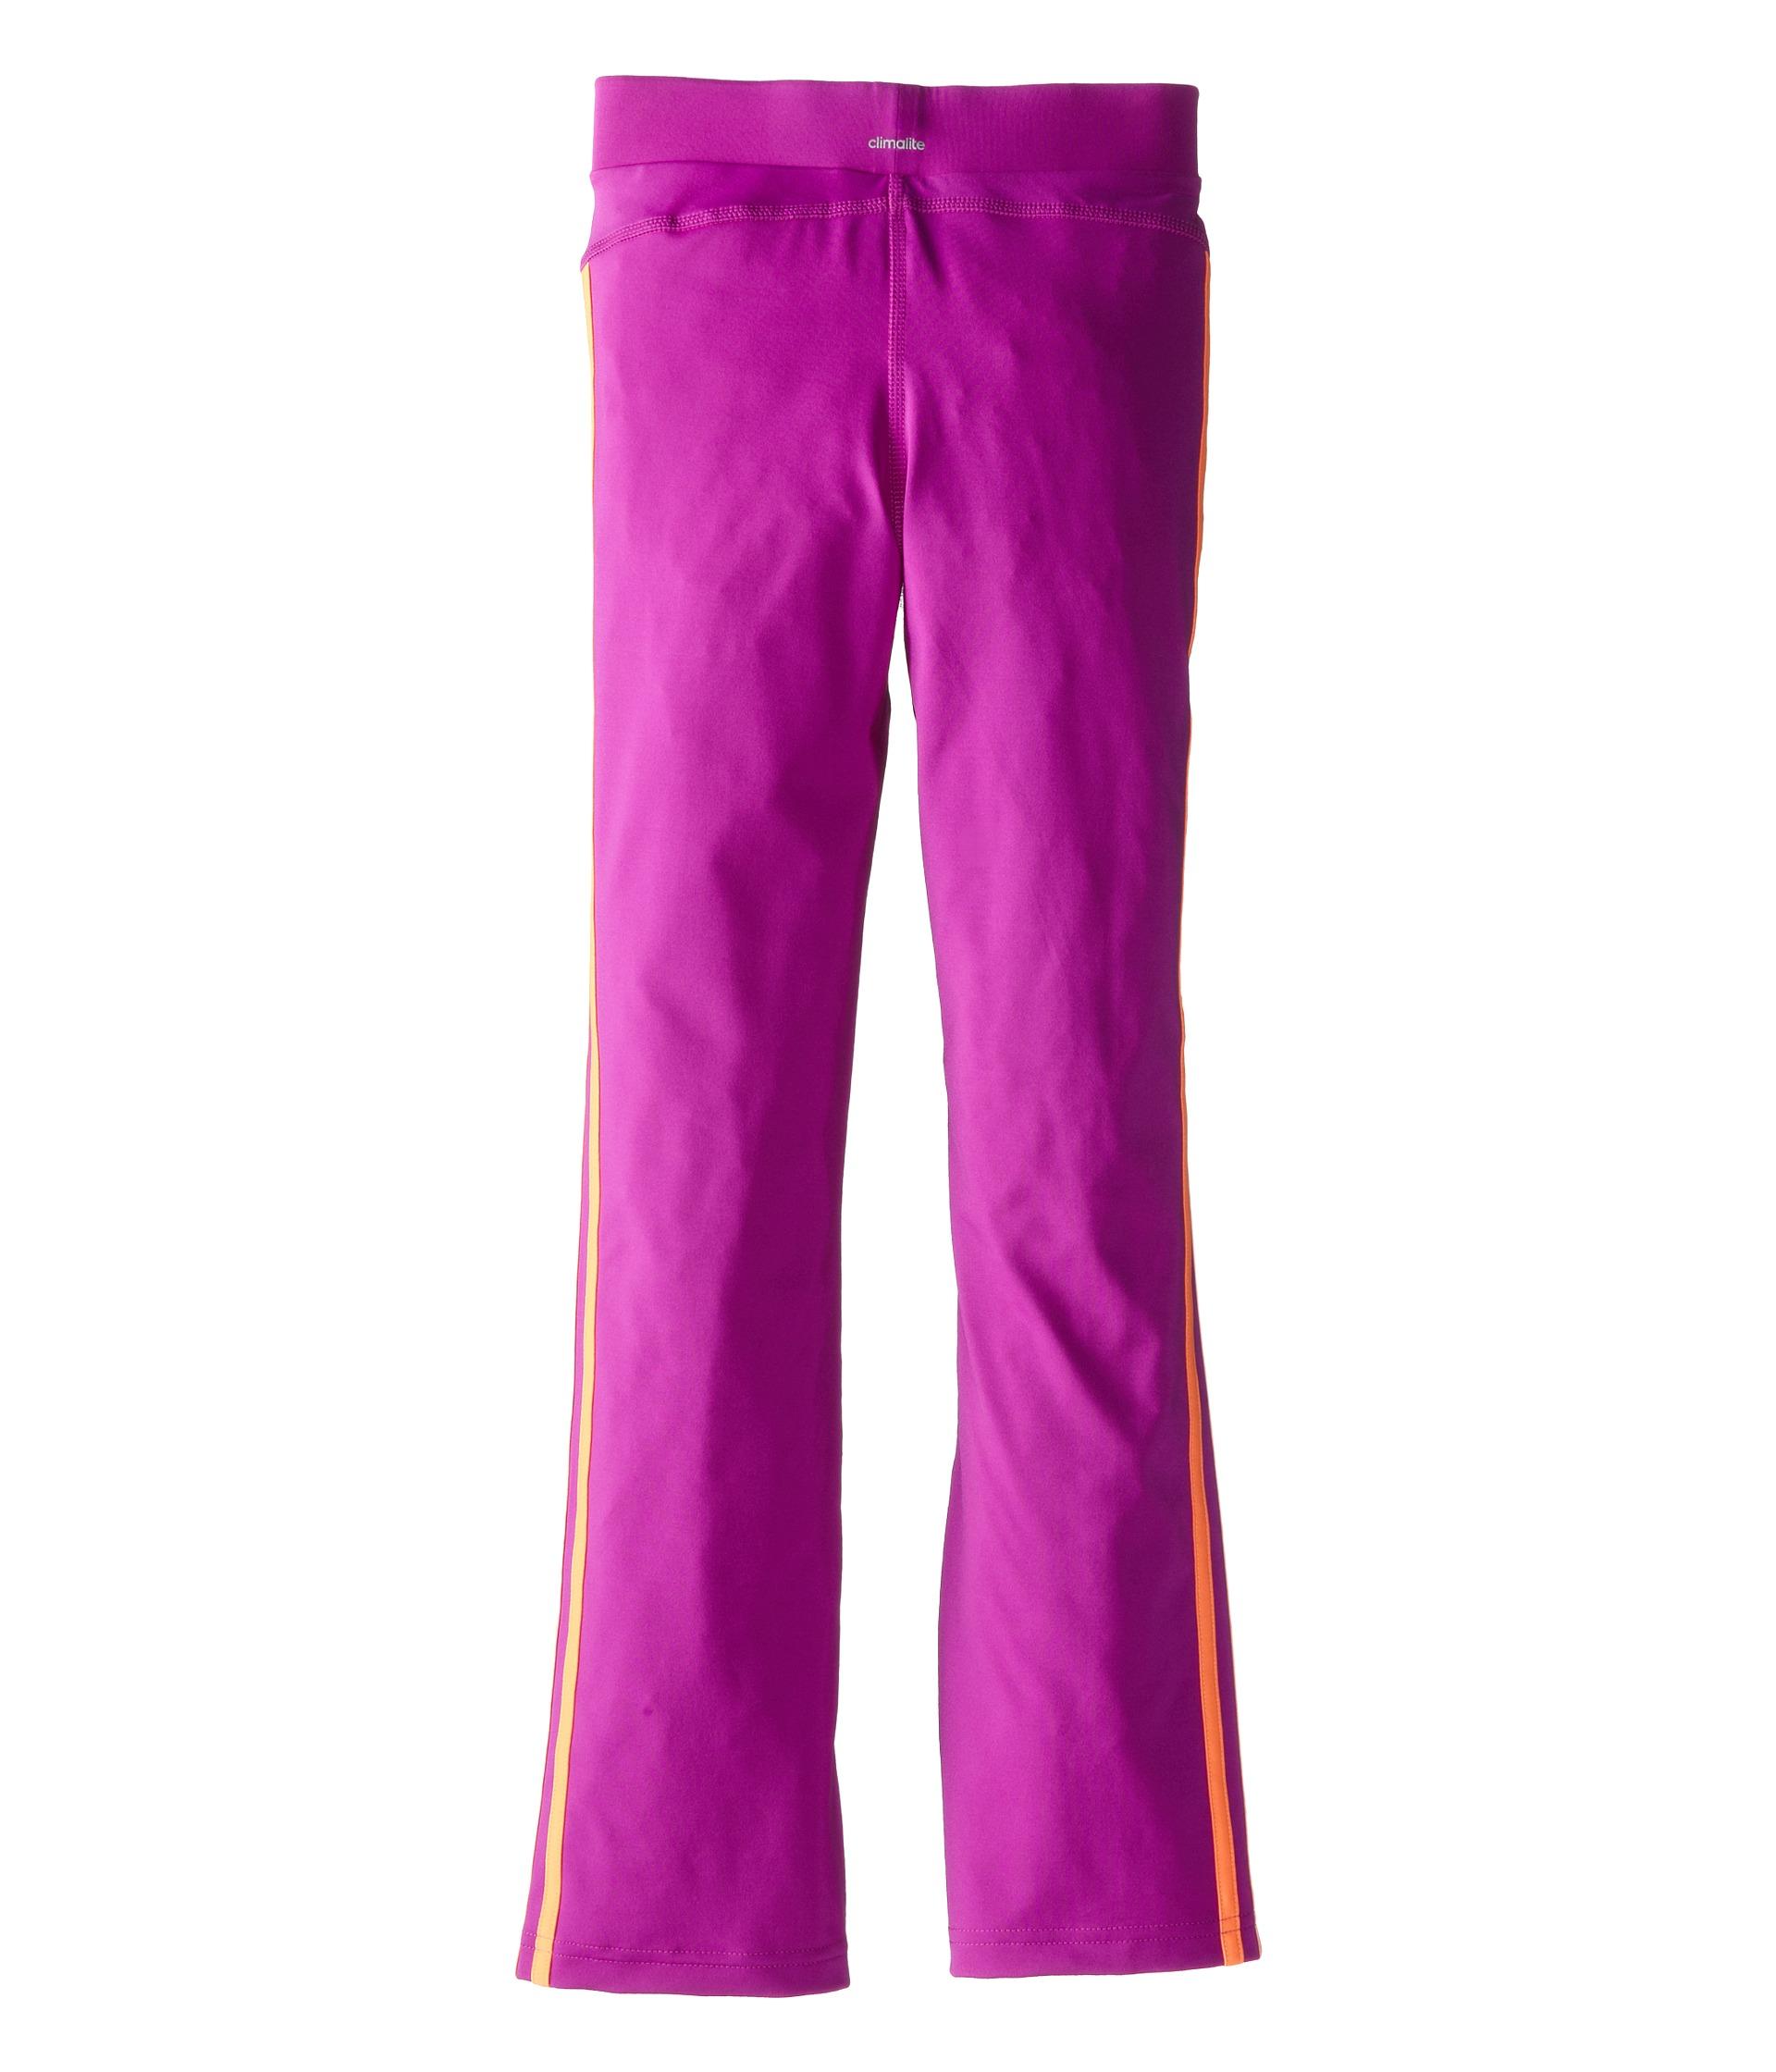 Adidas Kids Yoga Pants W/ Color Stripes (Big Kids) Flash